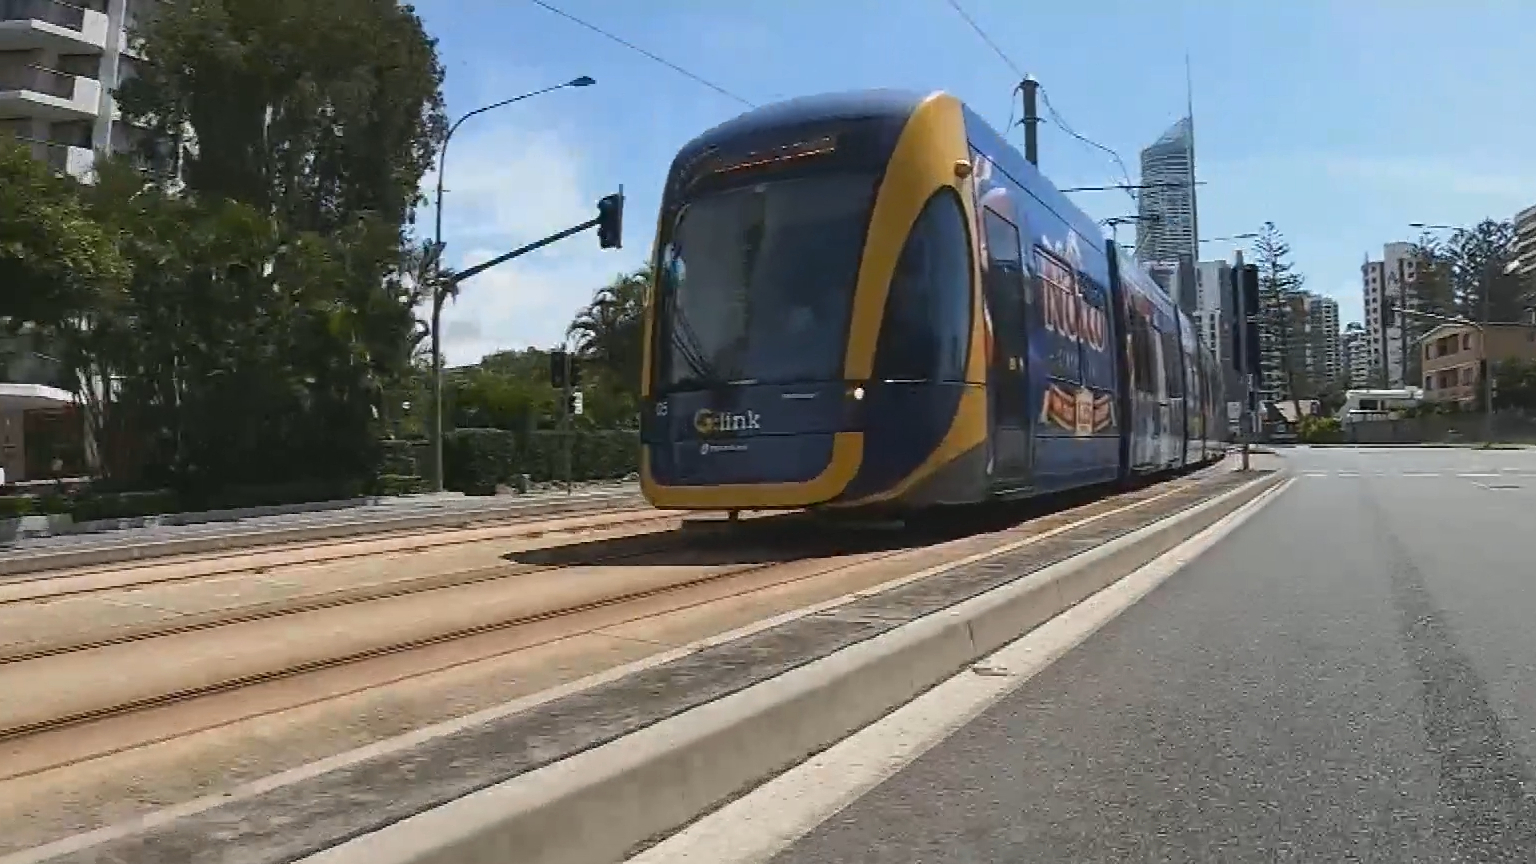 Queensland to fast-track Burleigh to Coolangatta light rail